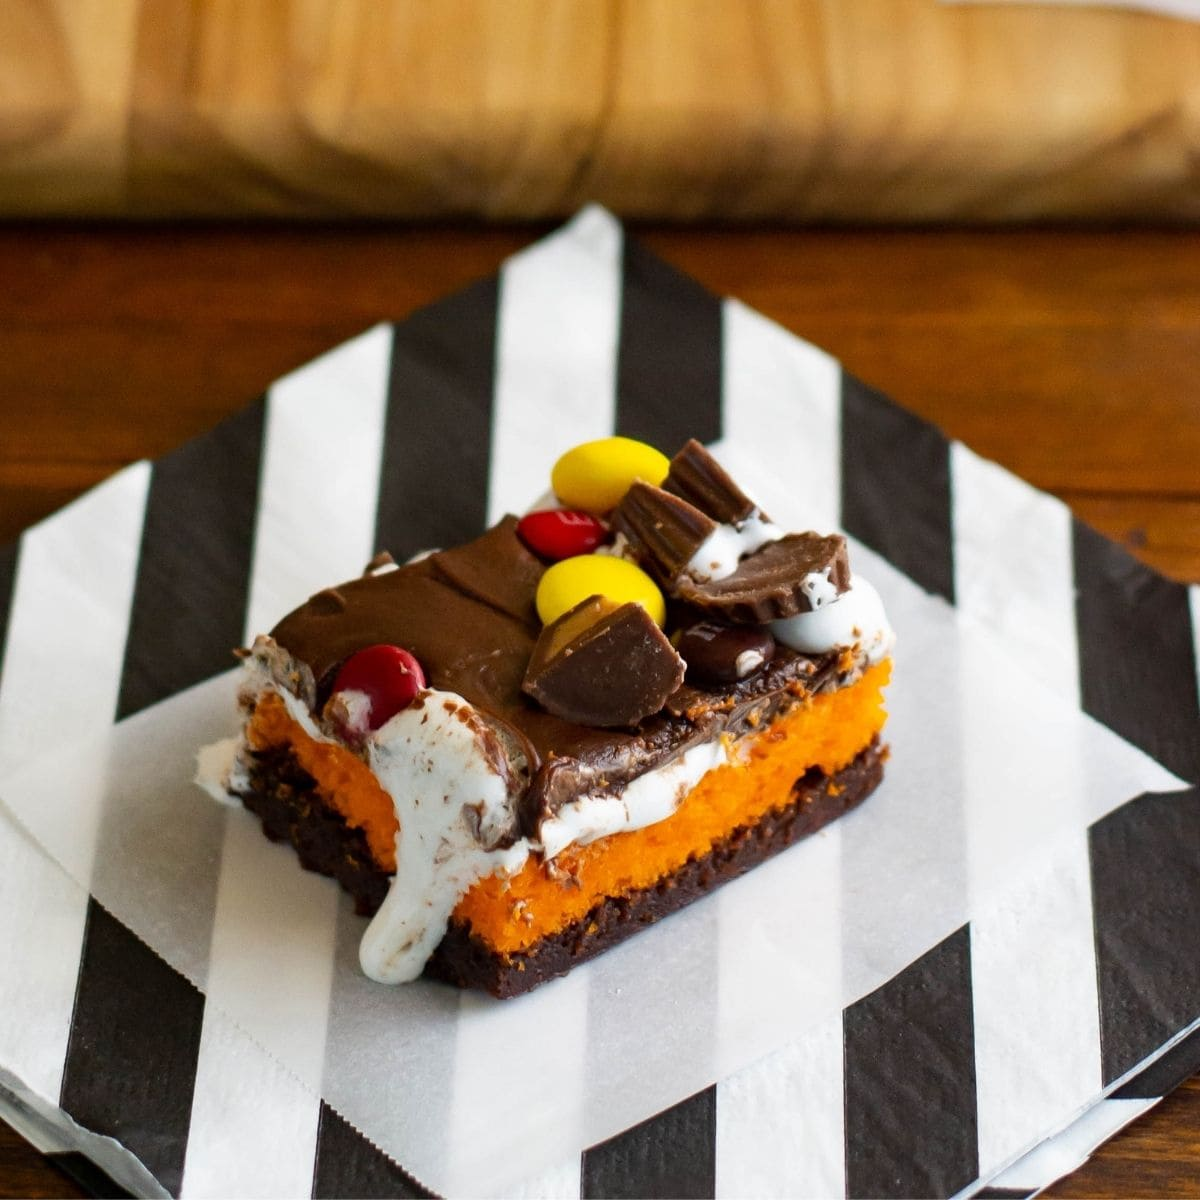 Halloween Brownie Cake bars on a black and white napkin.